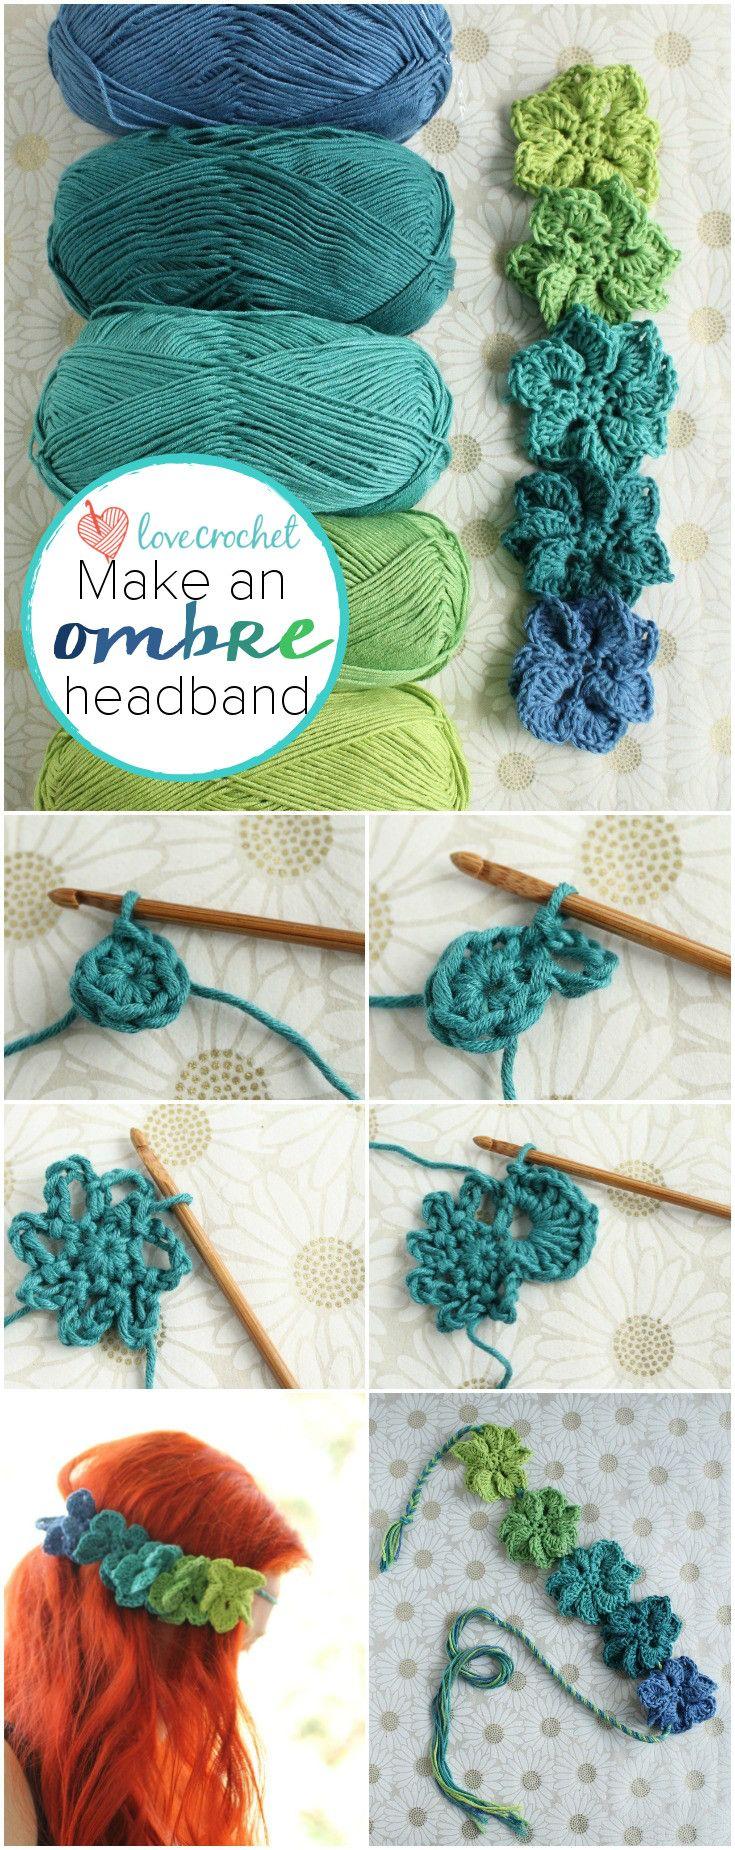 Free ombre headband tutorial on LoveCrochet for the summer festival season